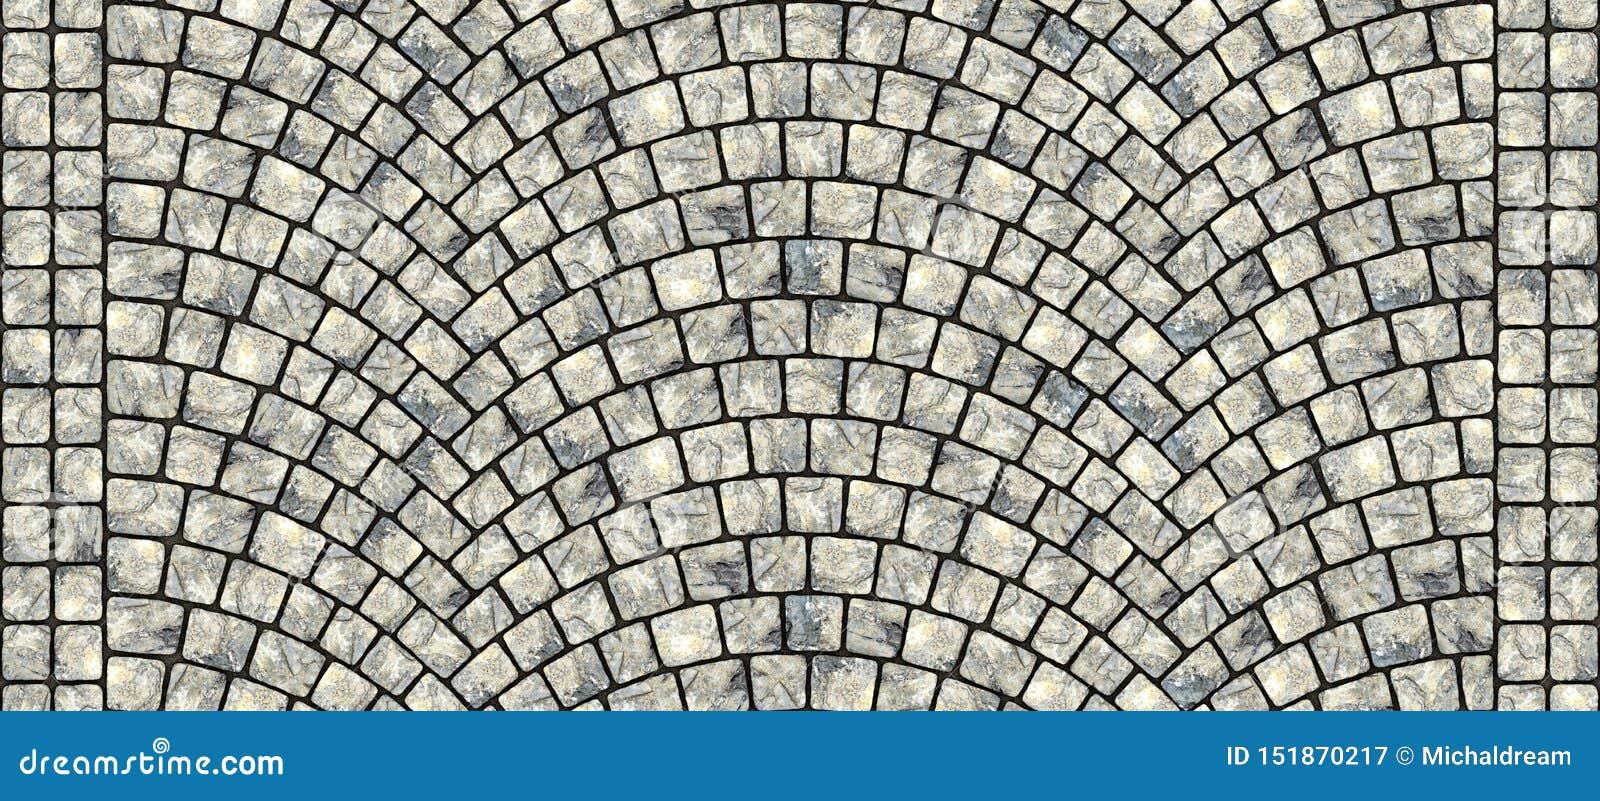 Road curved cobblestone texture 103